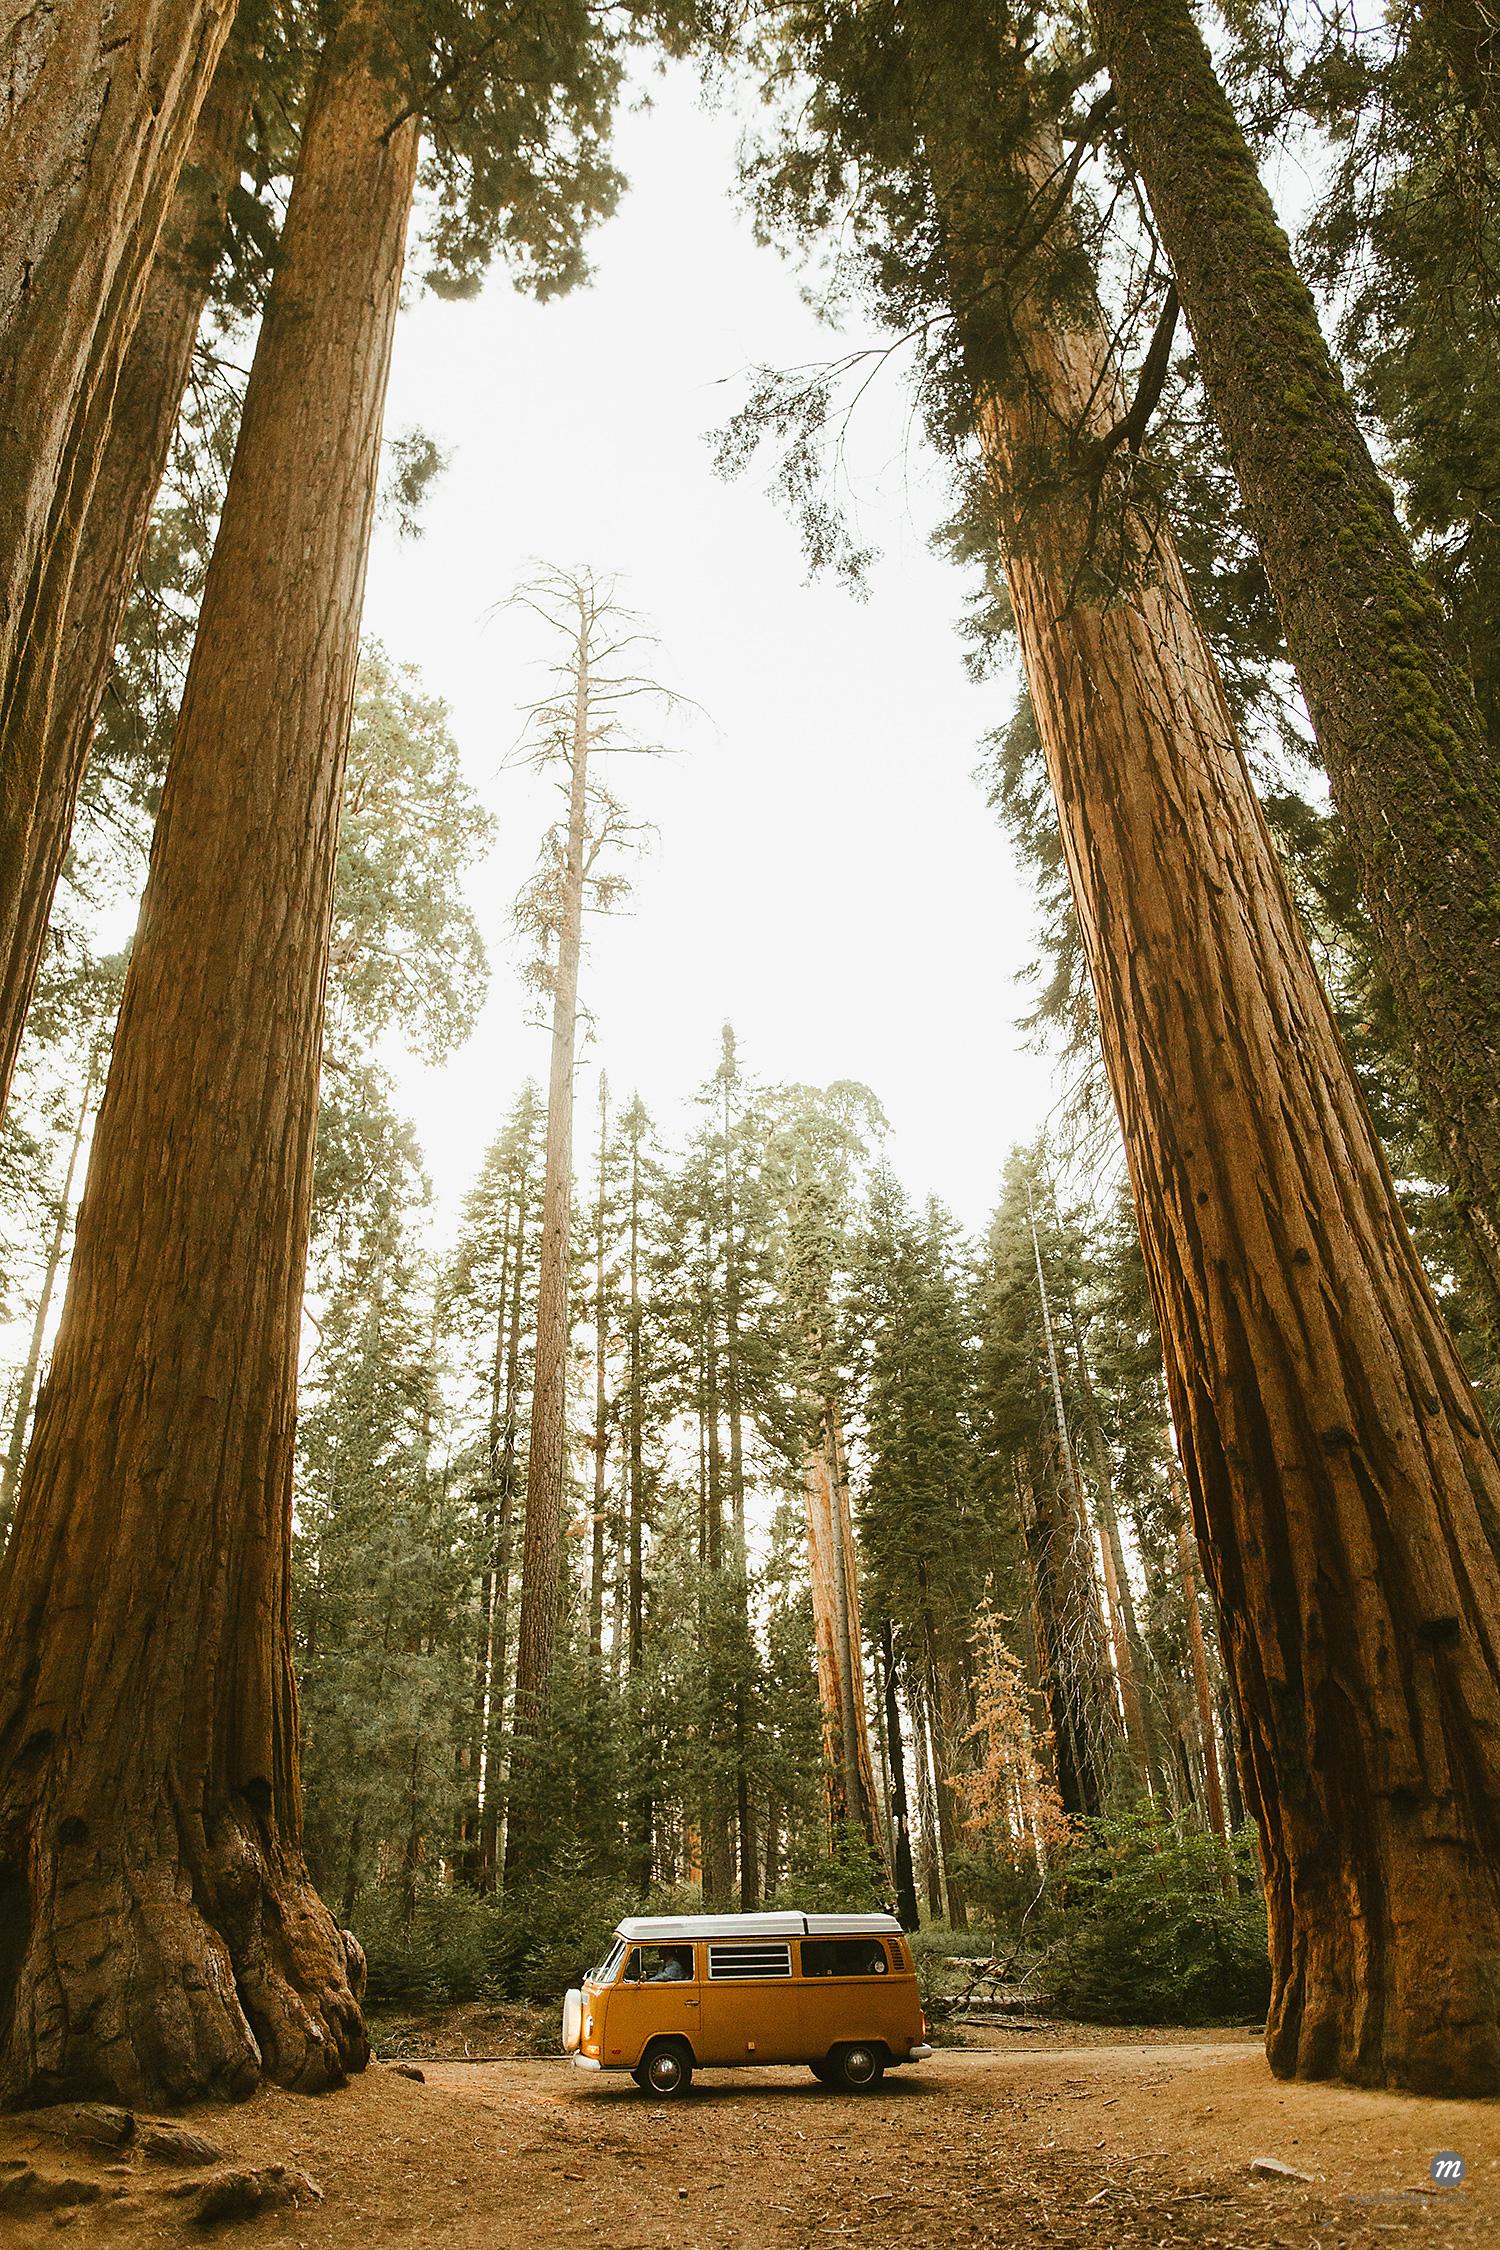 Camper van under sequoia tree, Sequoia National Park, California, USA  © Masterfile